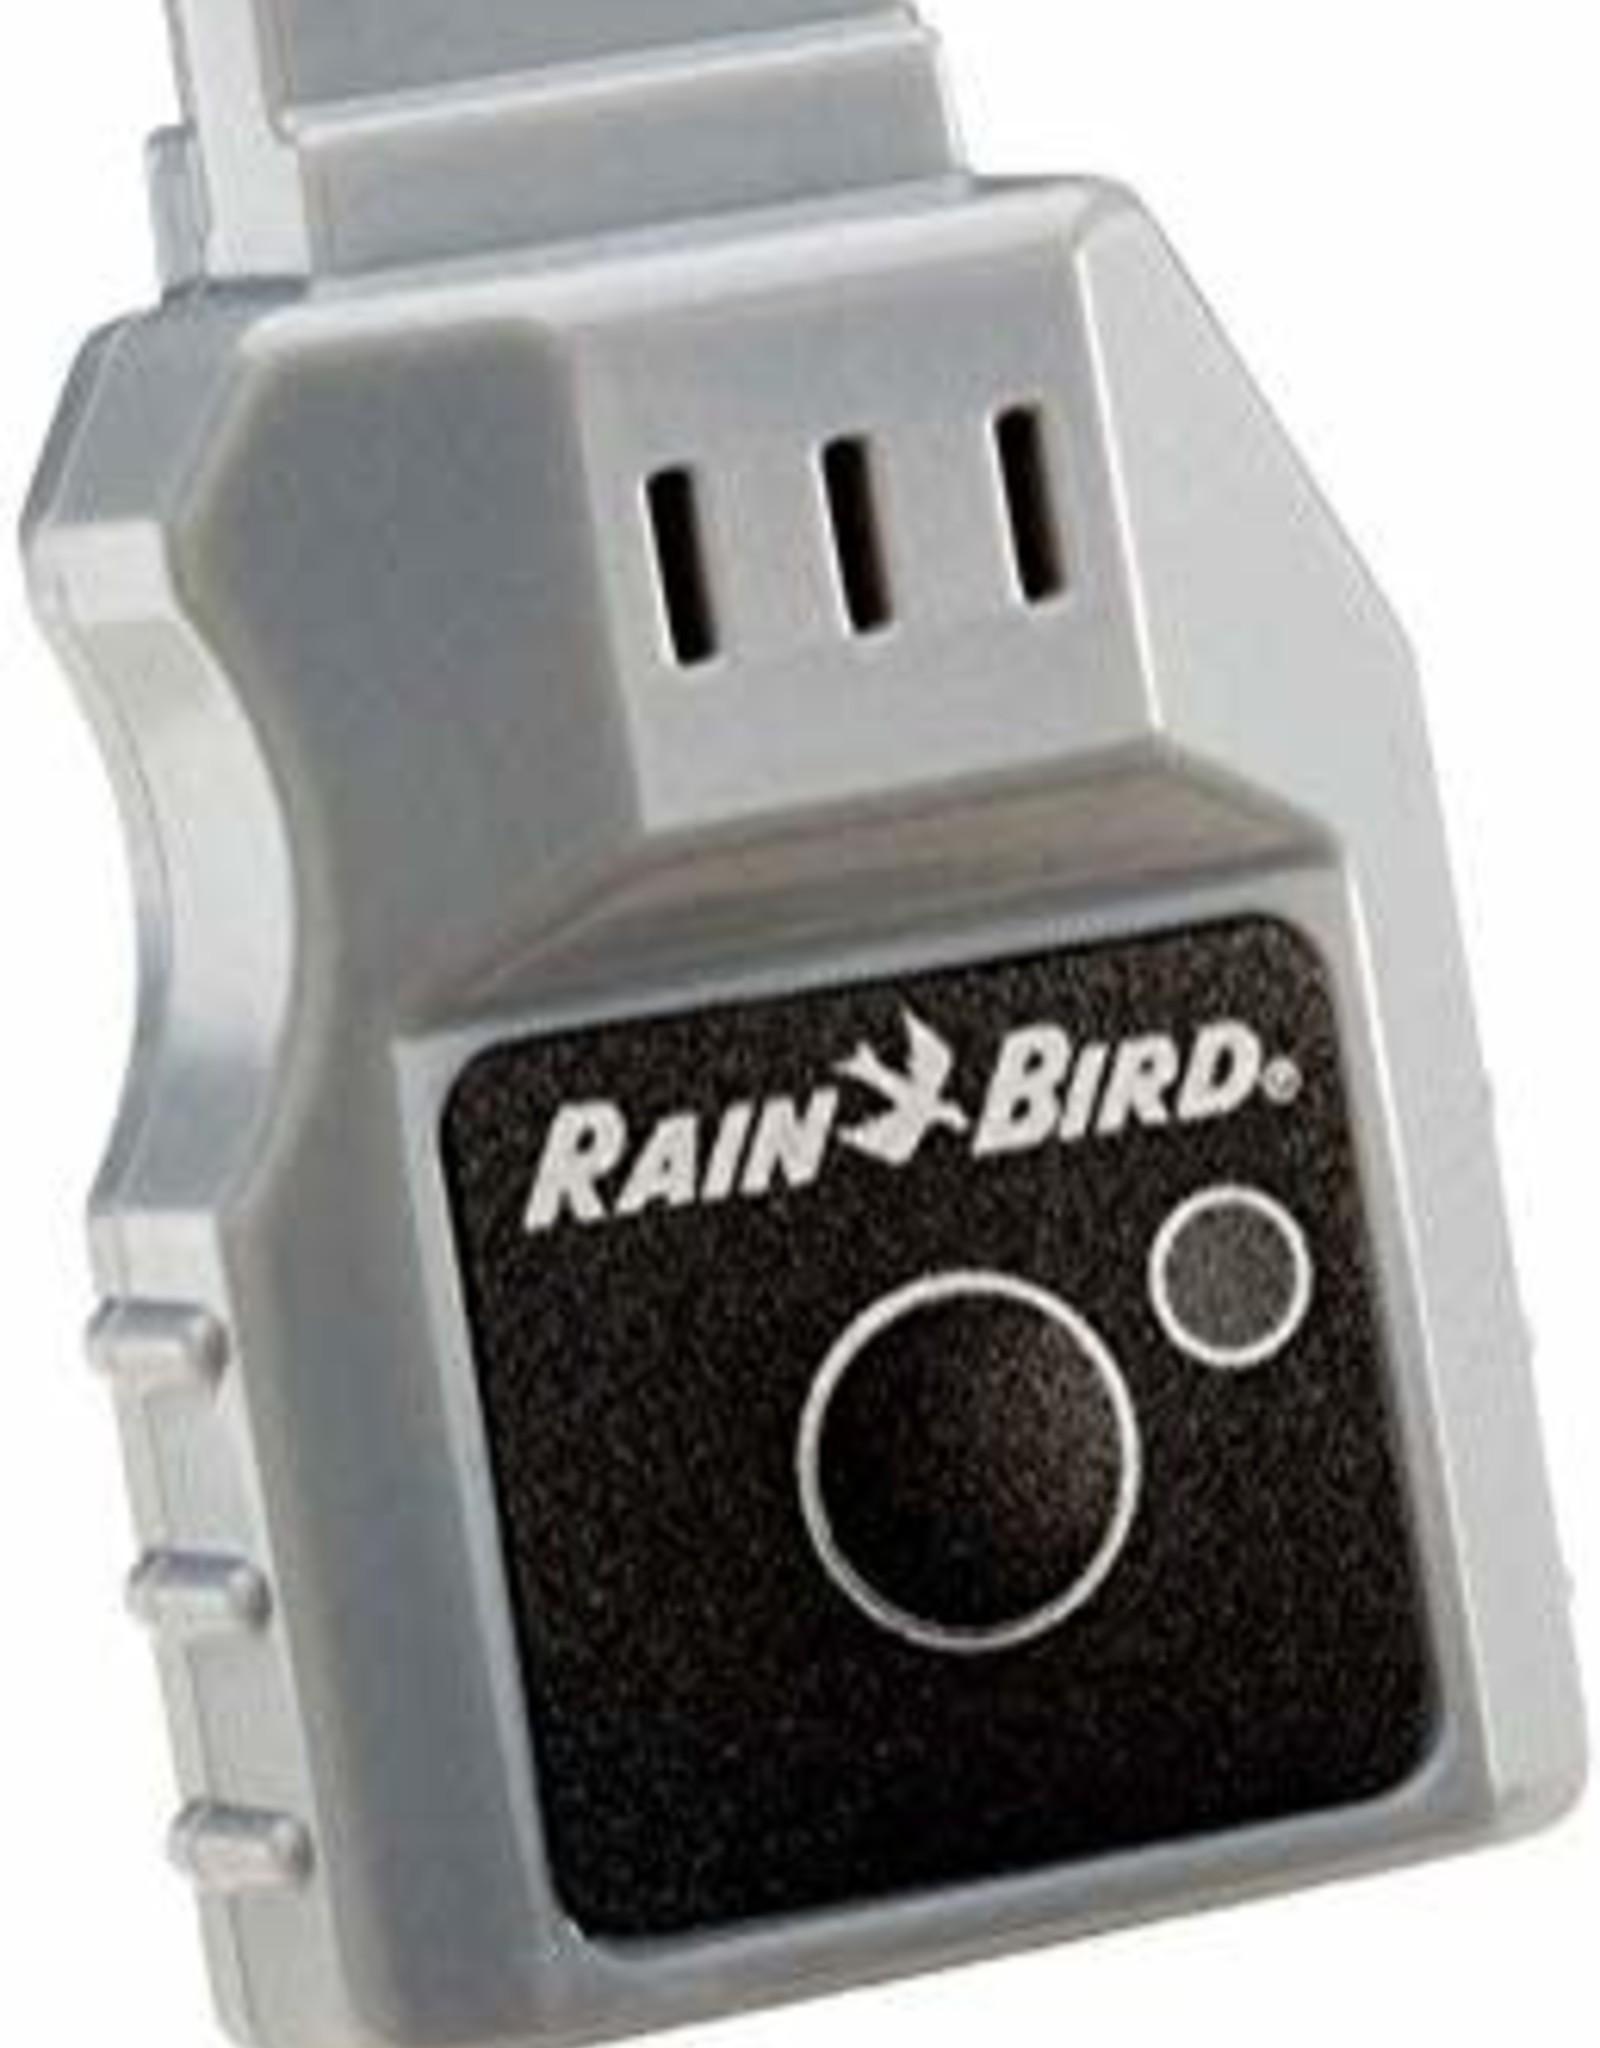 Rain Bird Rain Bird LNK WiFi Module Adapter LNKWIFI